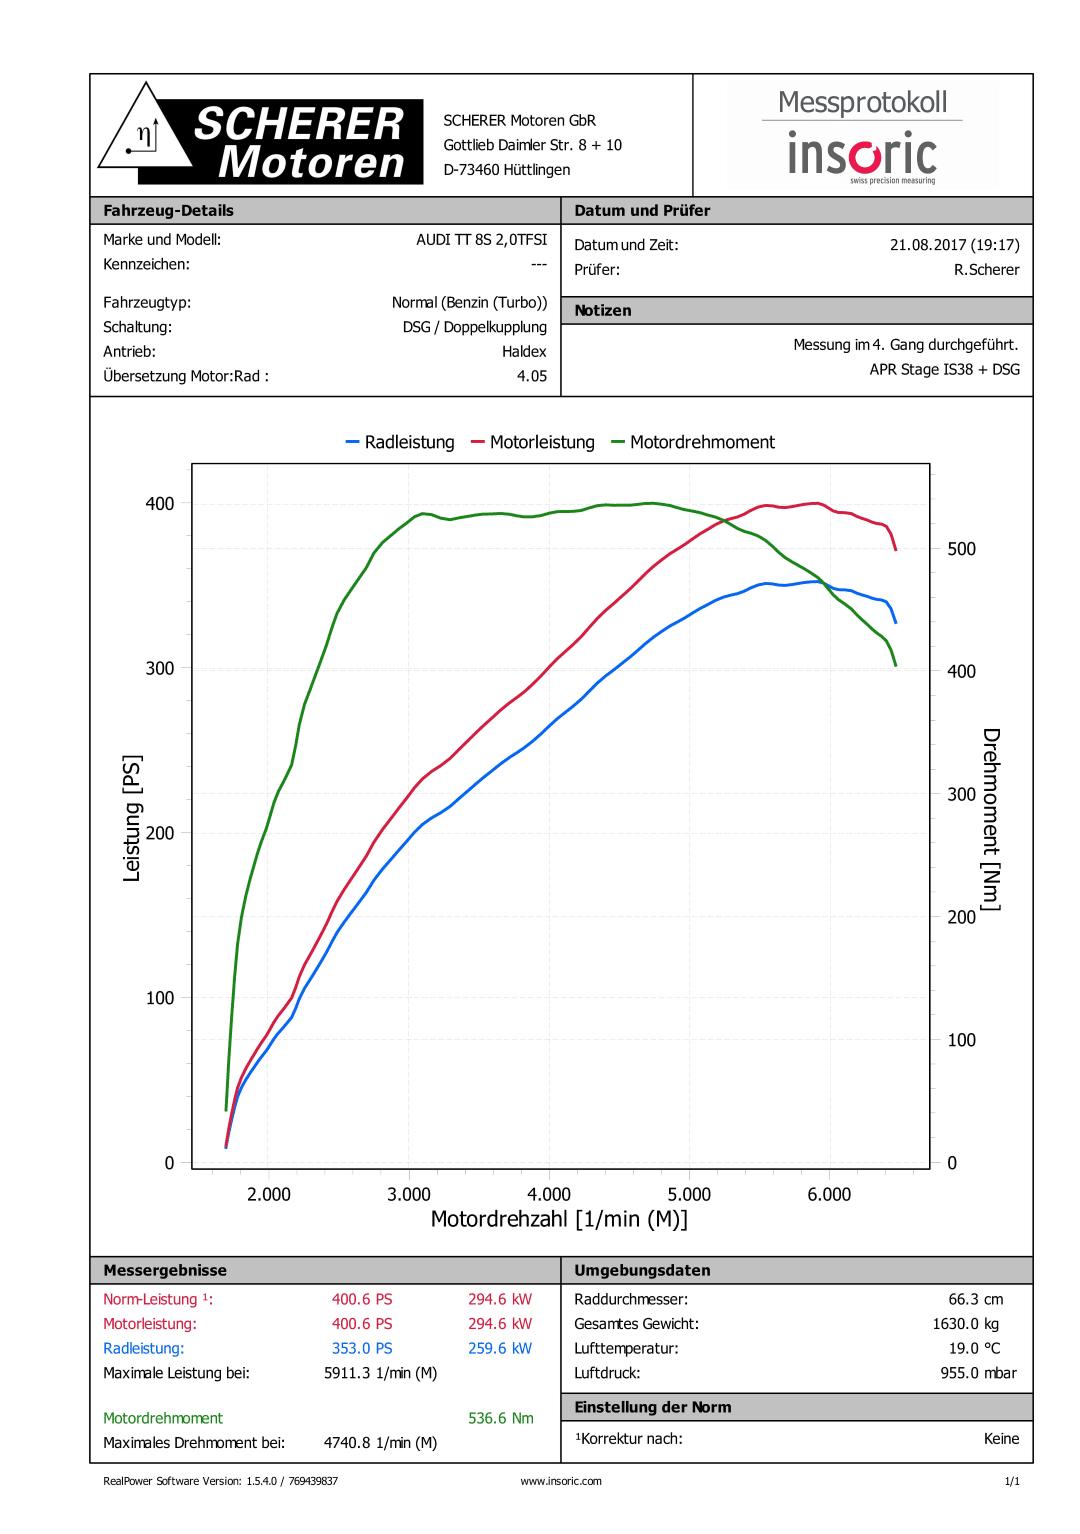 APR 2.0TSI IS38 Upgrade mit Sport Downpipe Insoric Leistungsdiagramm